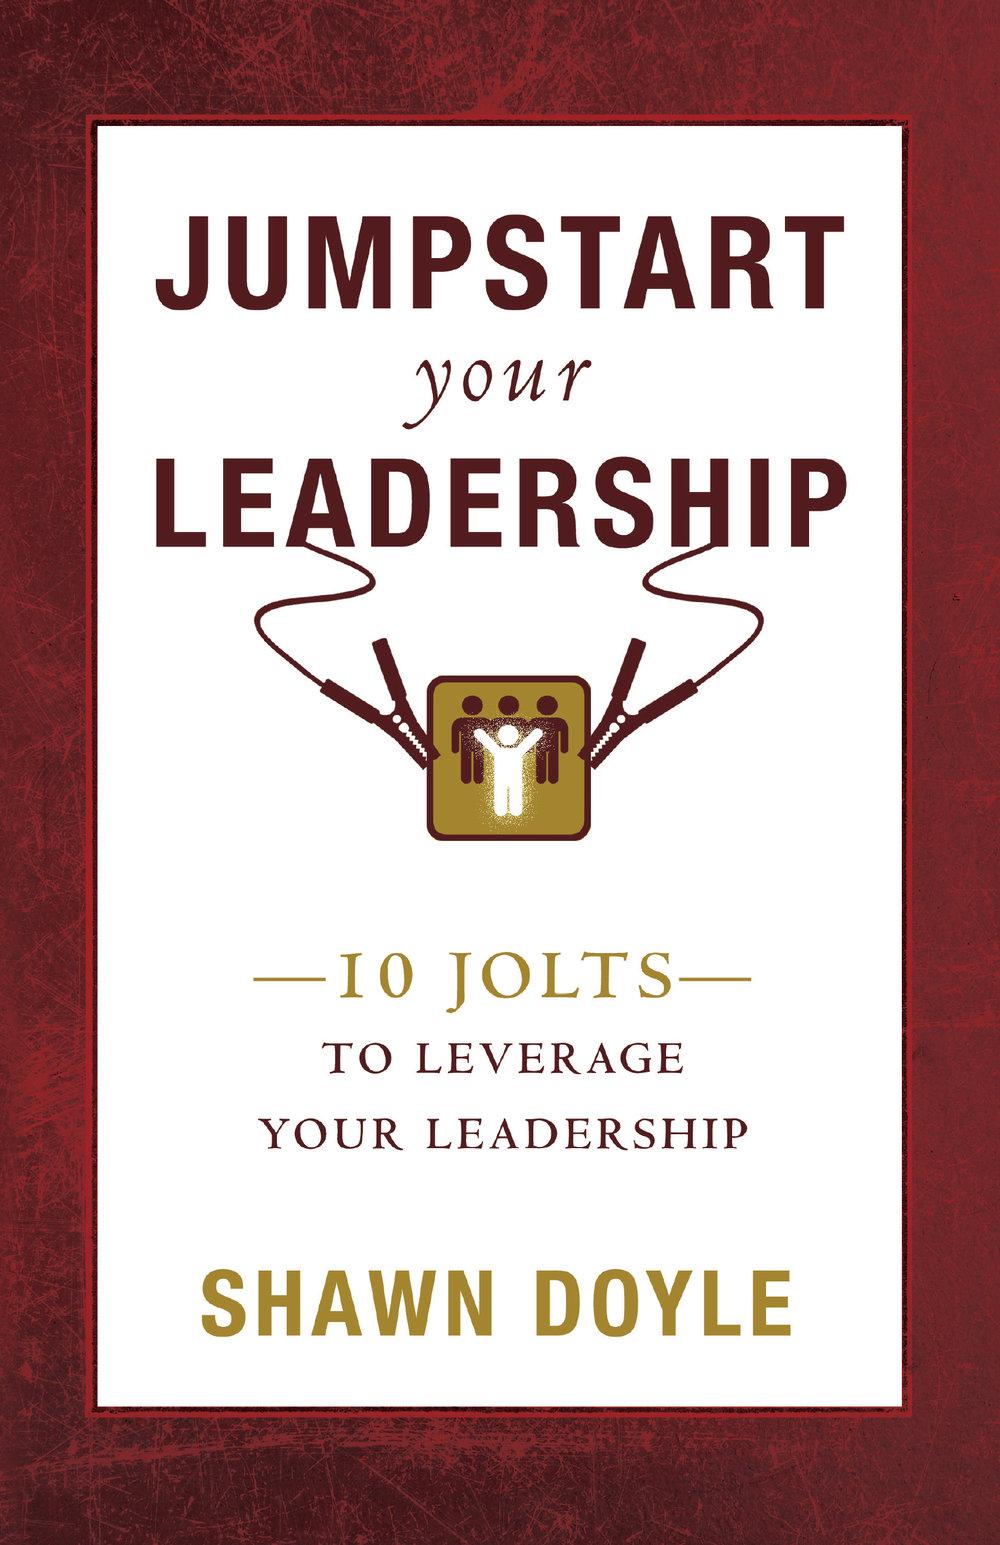 Jumpstart Your Leadership - Shawn Doyle CSP